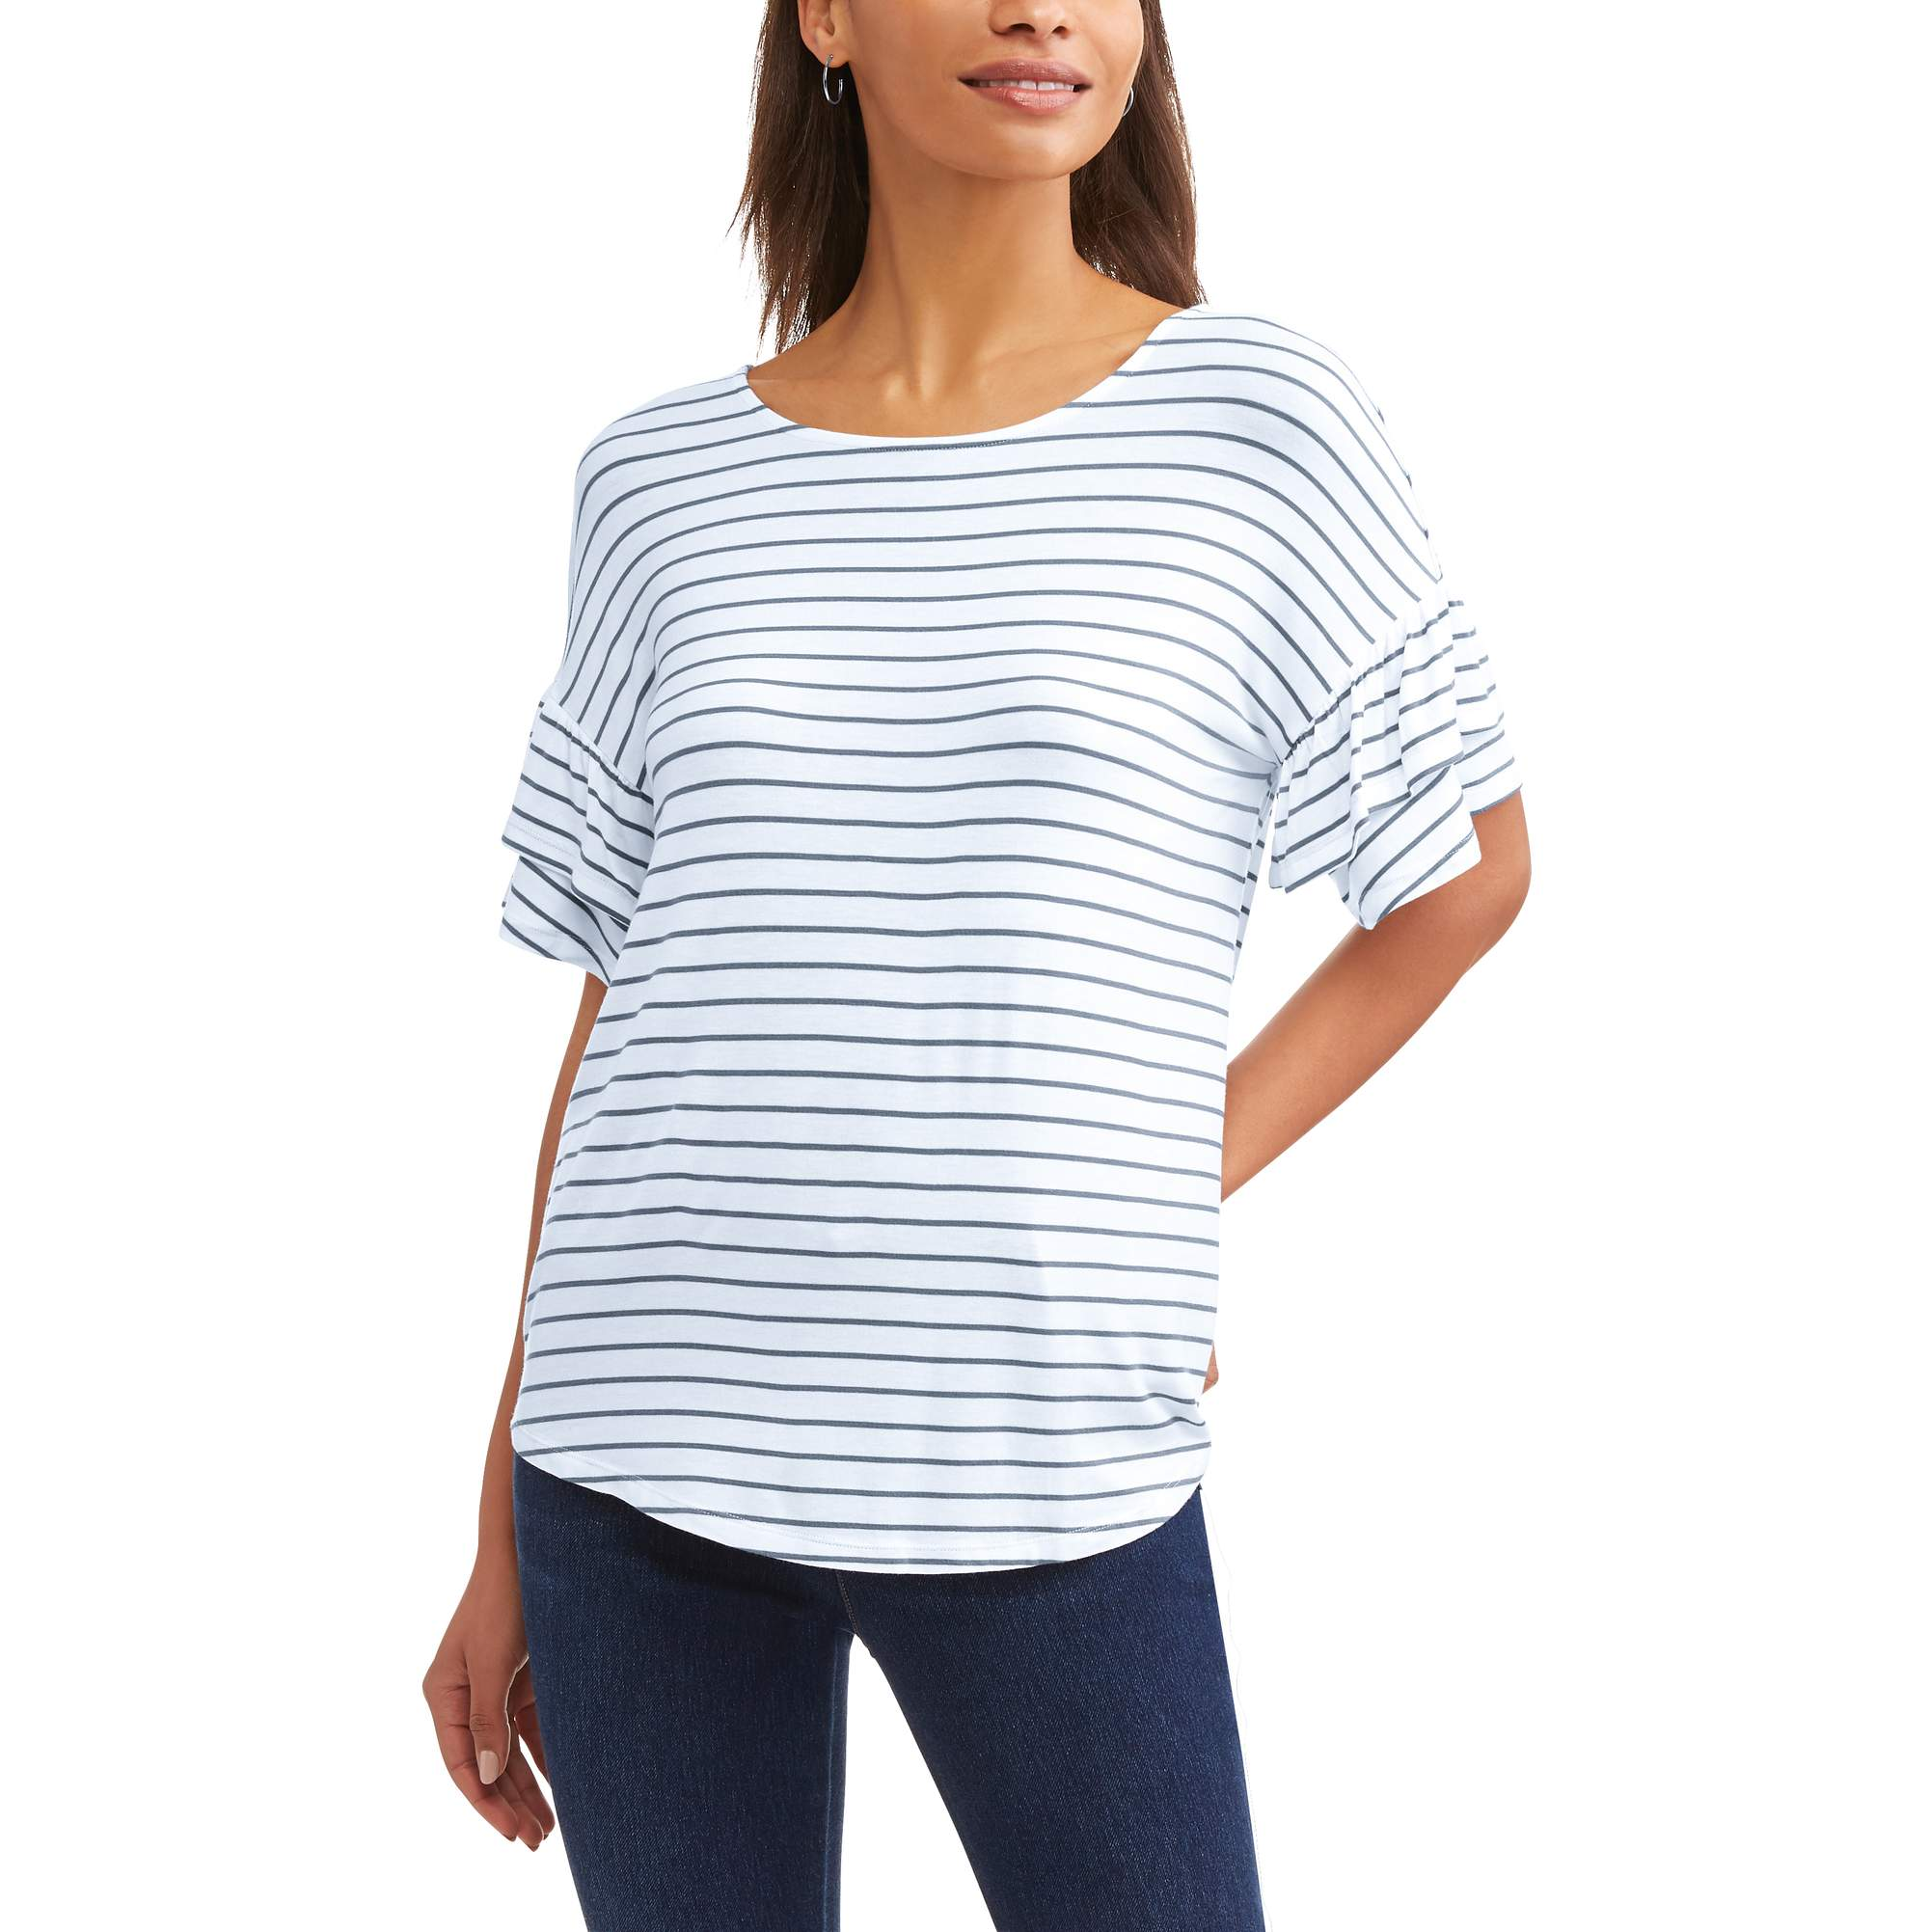 Women's Short Sleeve Scoopneck Ruffle T-Shirt